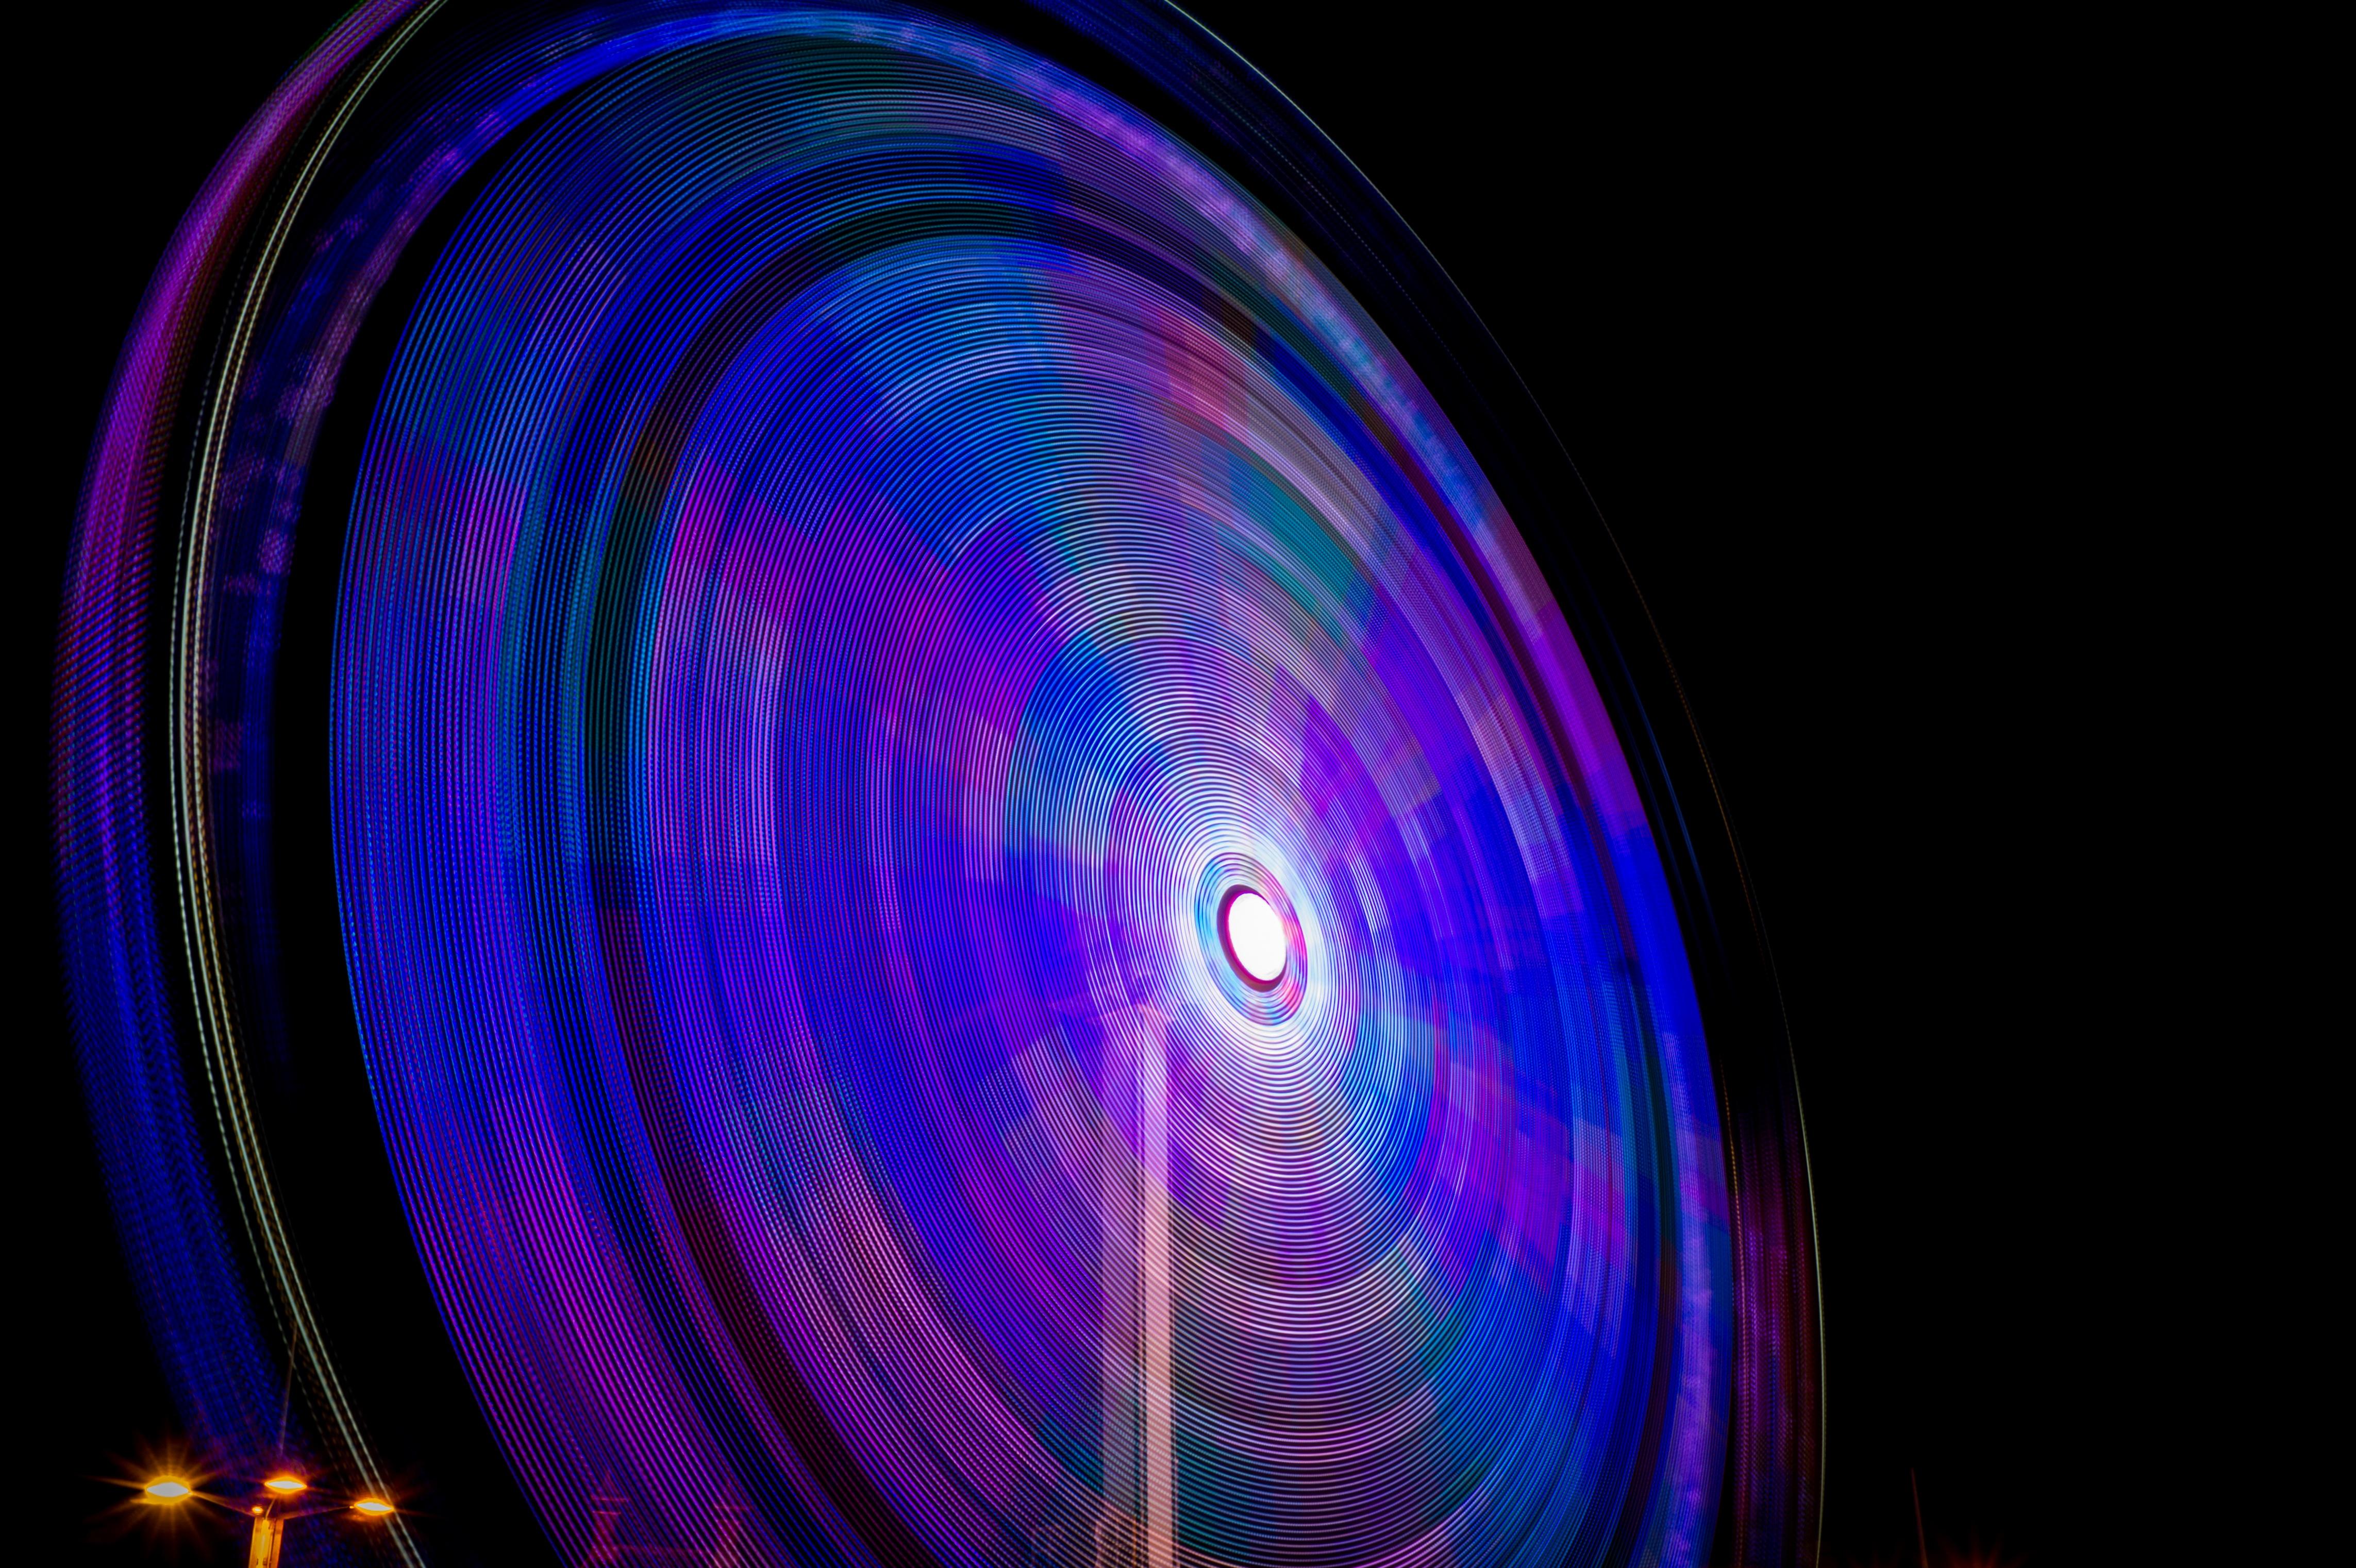 Light Blue Aesthetic Photography